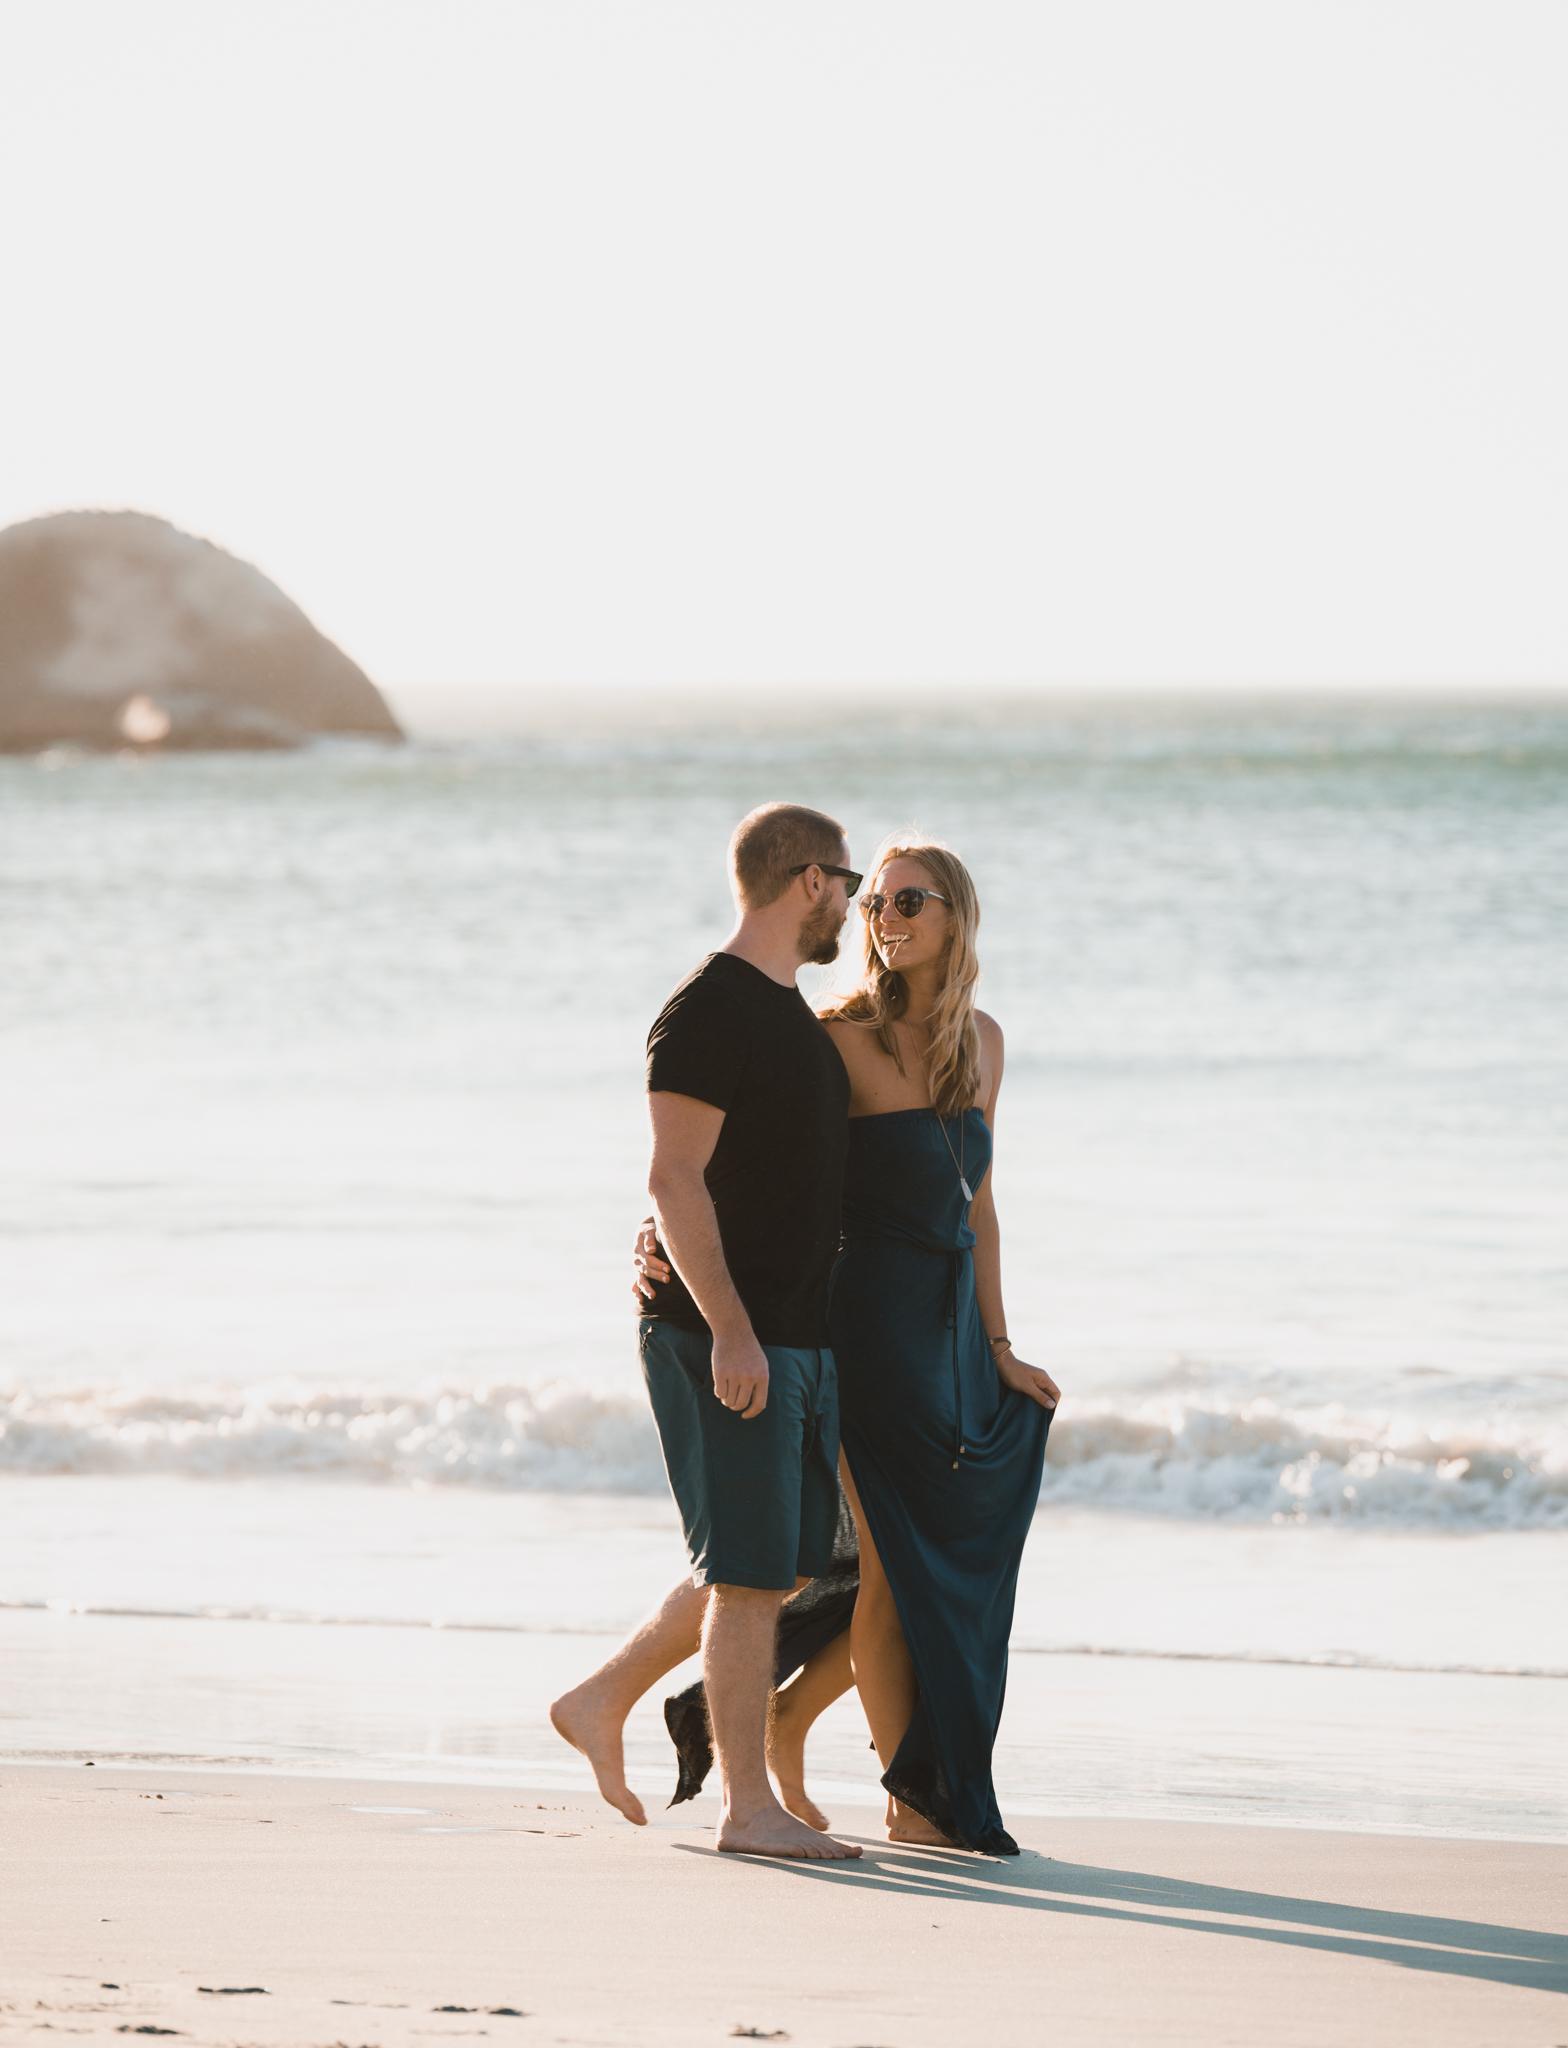 Ross & Candice engagement (107 of 166).JPG